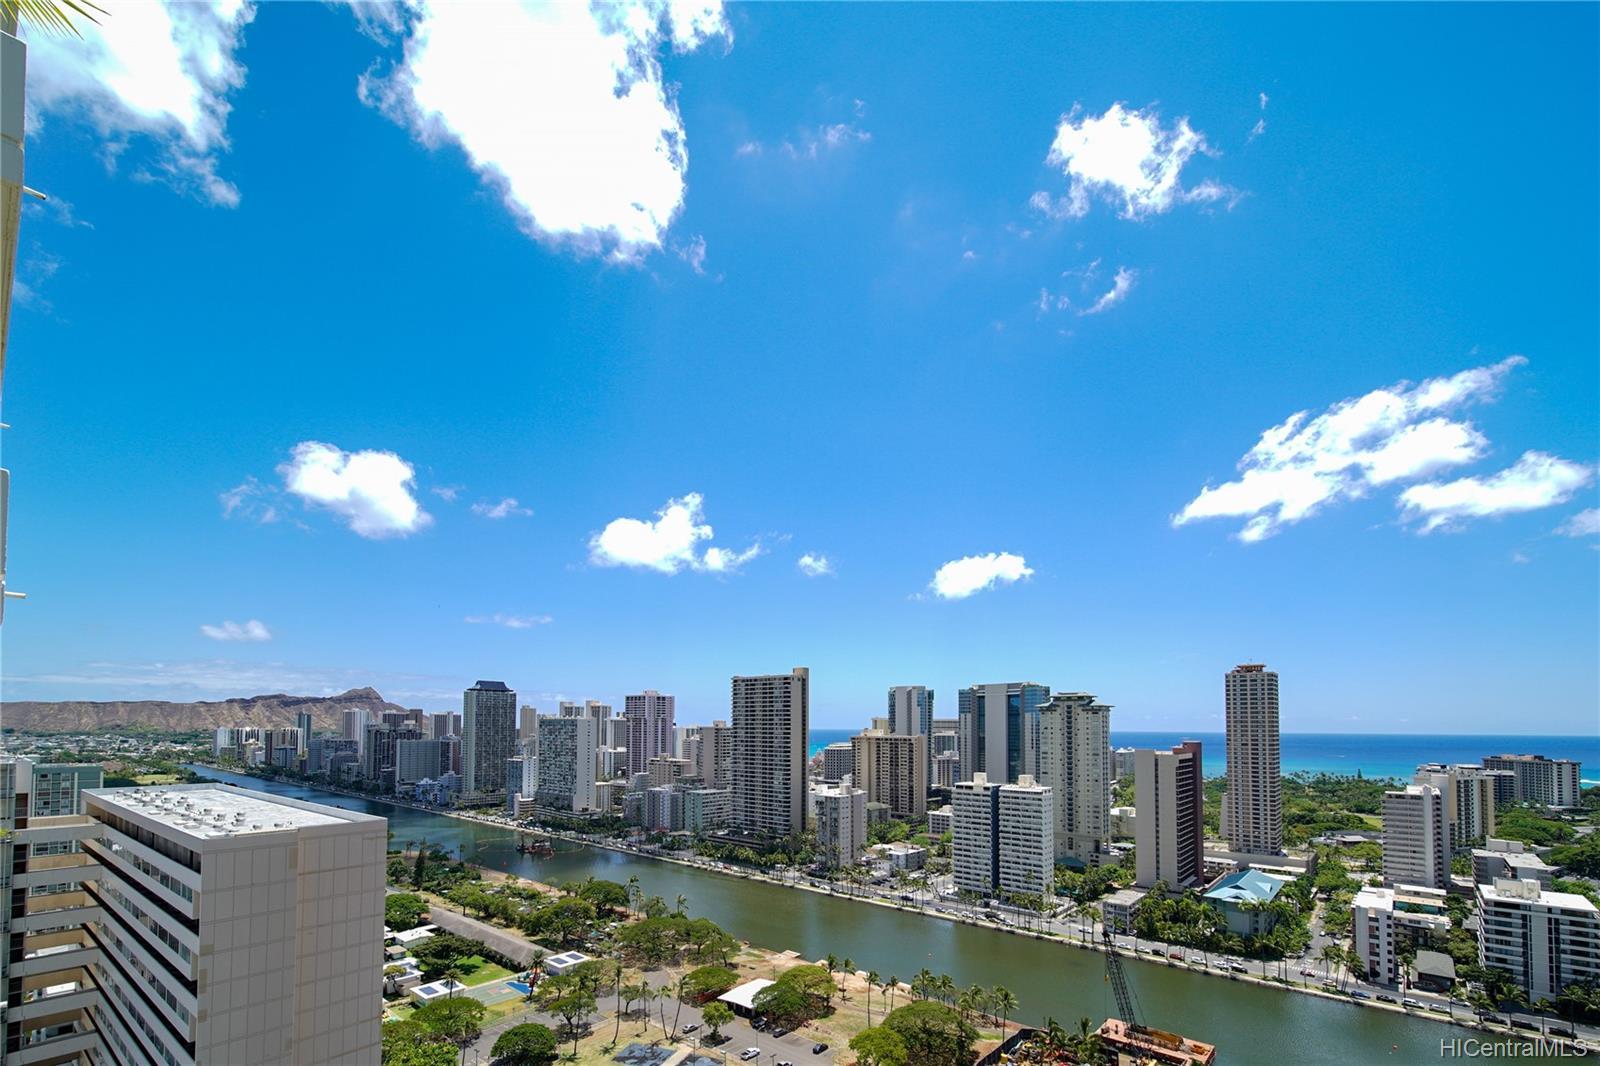 MARCO POLO APTS condo # 2909, Honolulu, Hawaii - photo 8 of 25